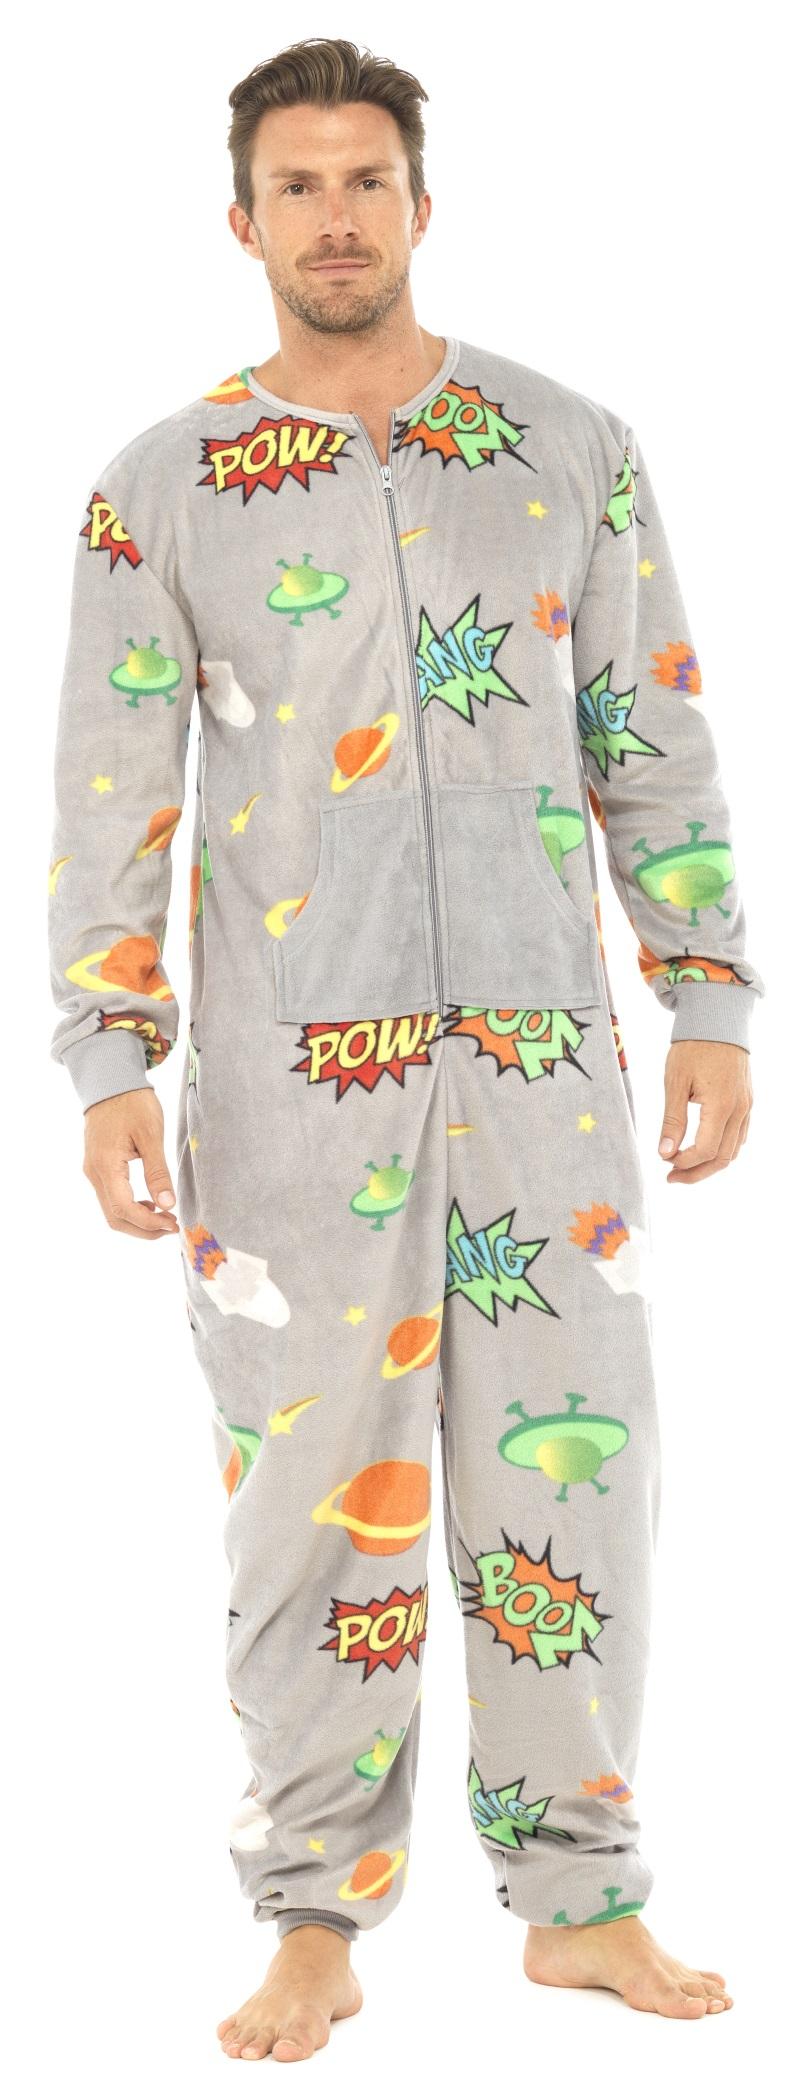 Mens full length fleece onesie zip all in one jumpsuit for Mens dress shirt onesie